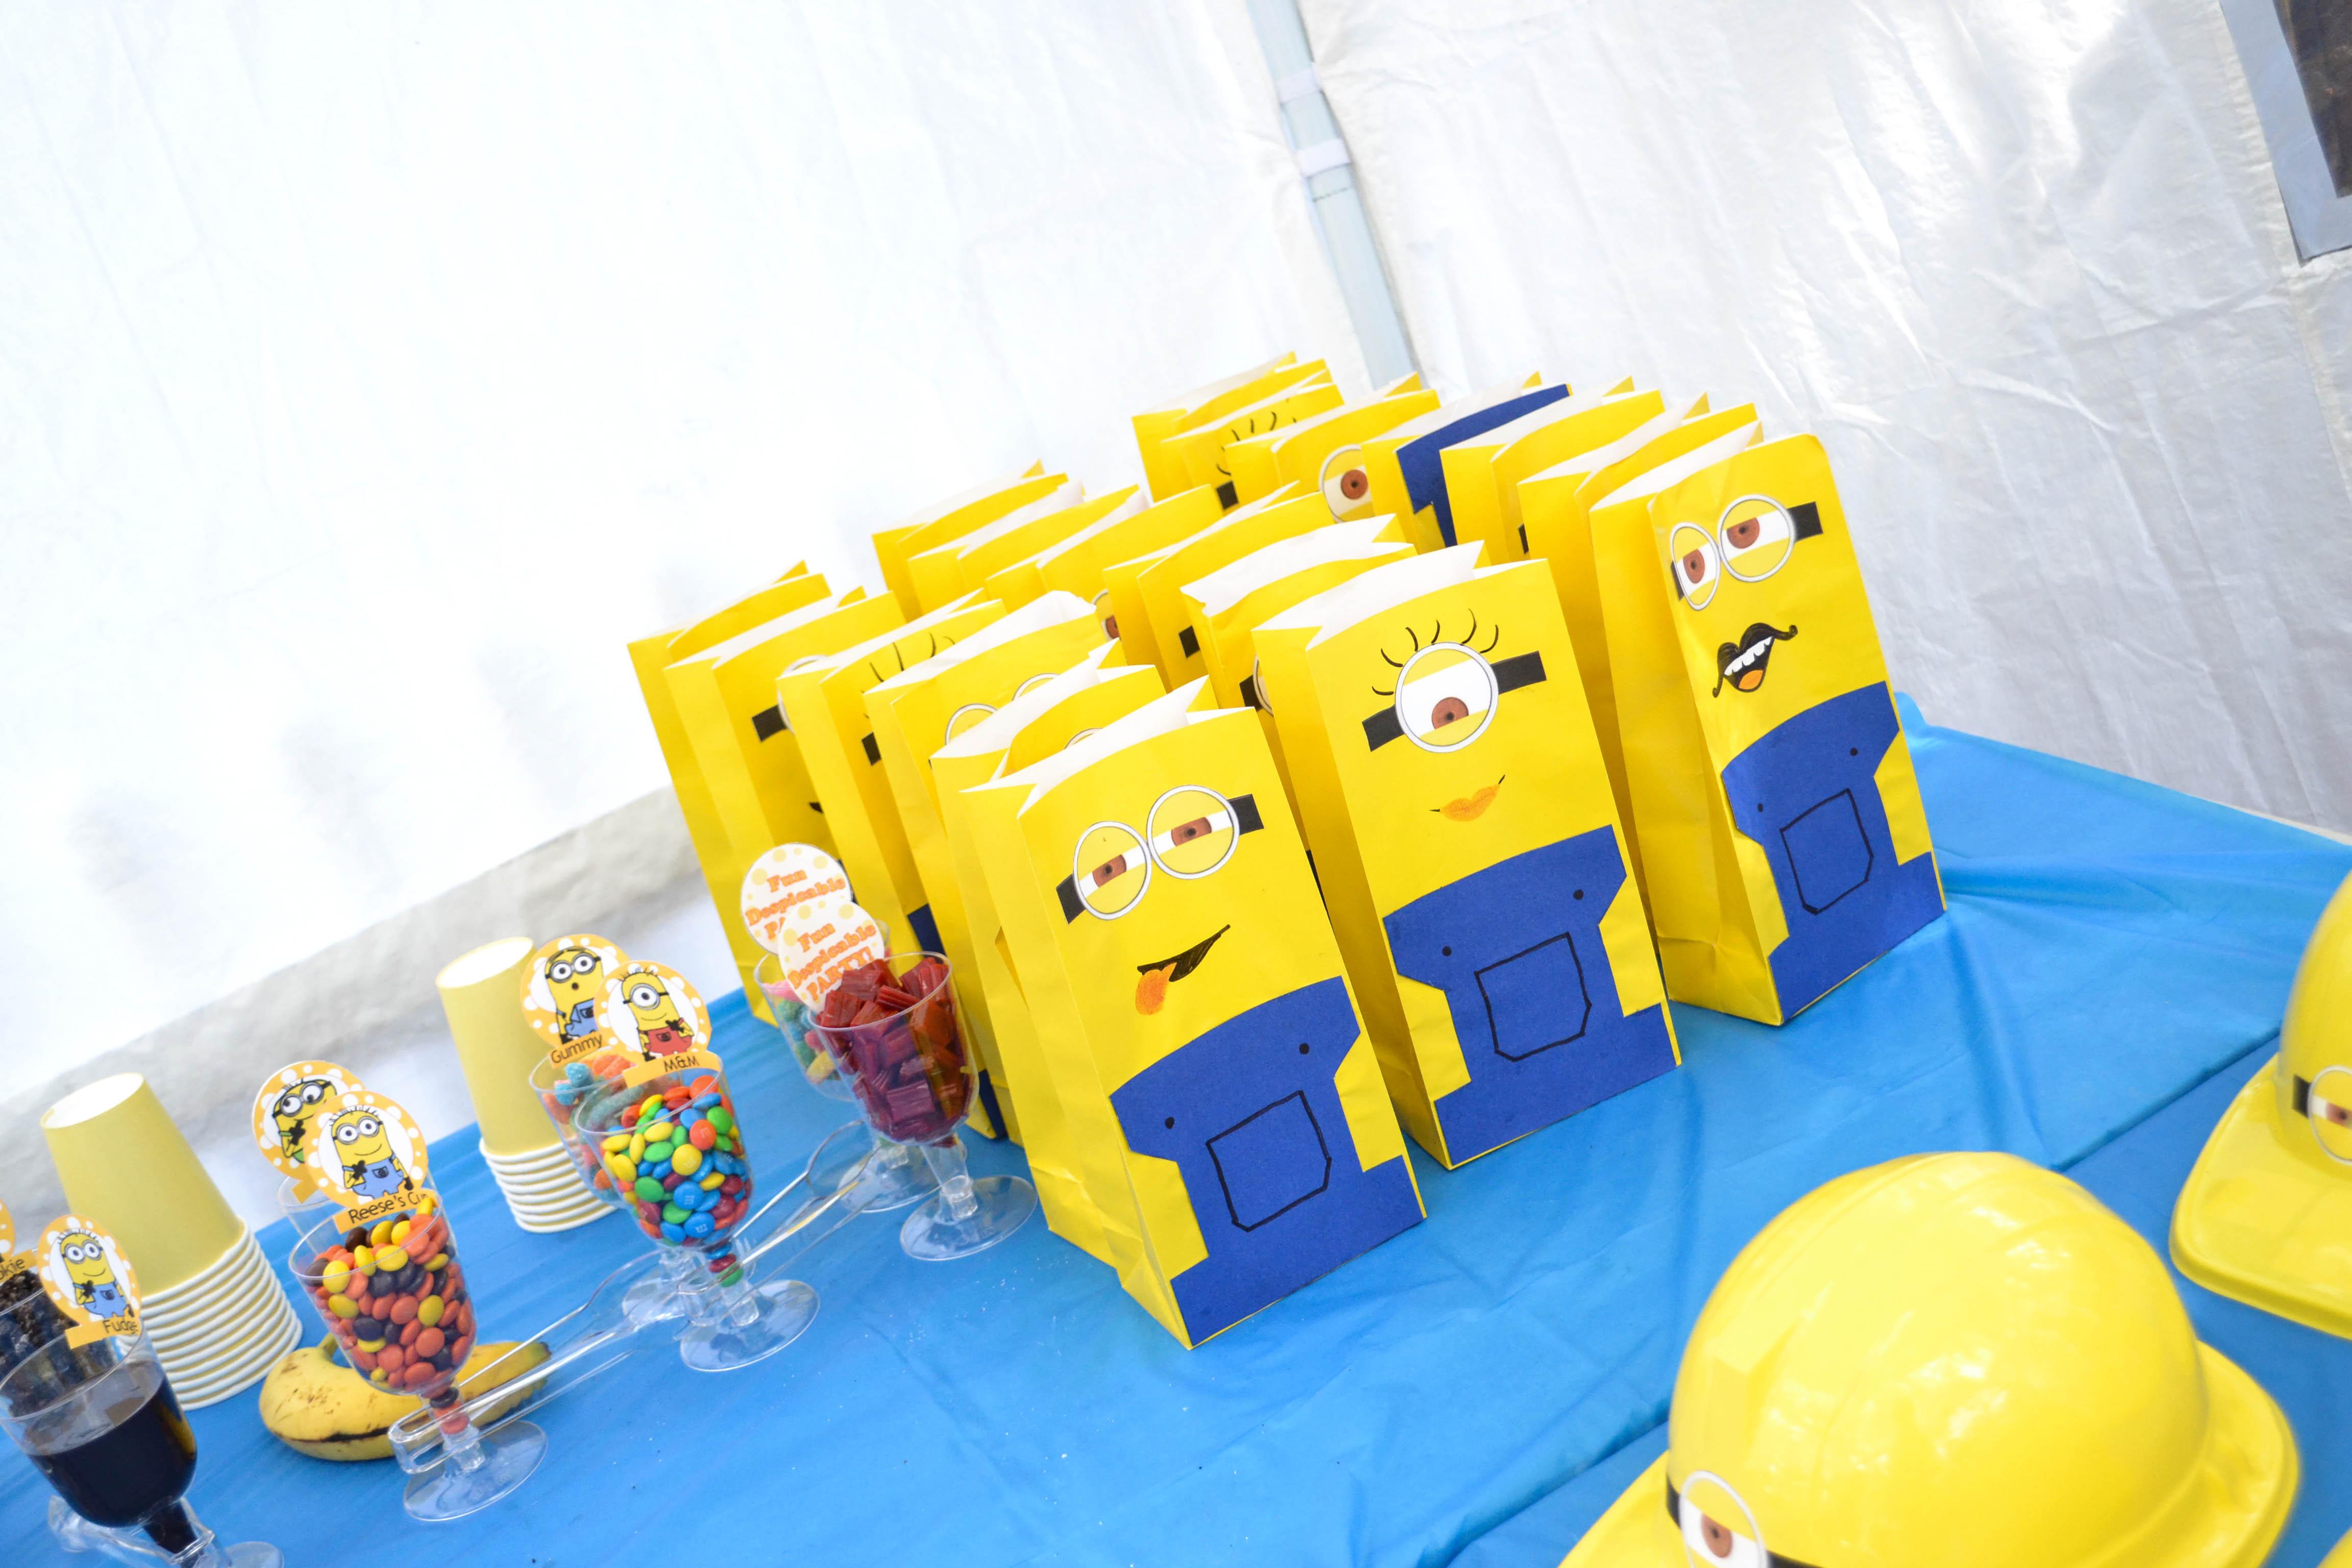 Handmade minions on bags